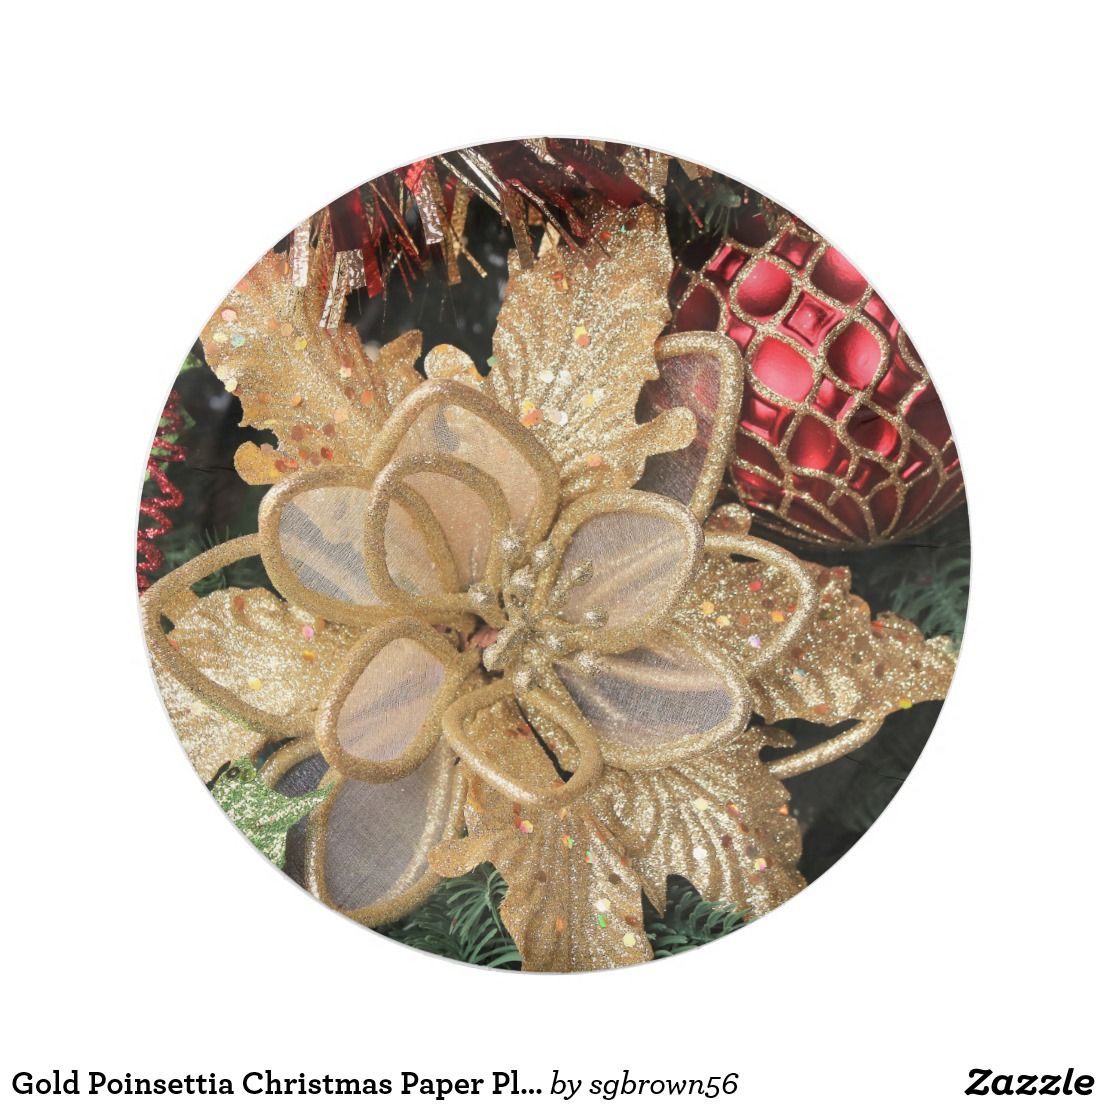 Gold Poinsettia Christmas Paper Plates Zazzle Com Christmas Paper Plates Christmas Dinnerware Paper Plates